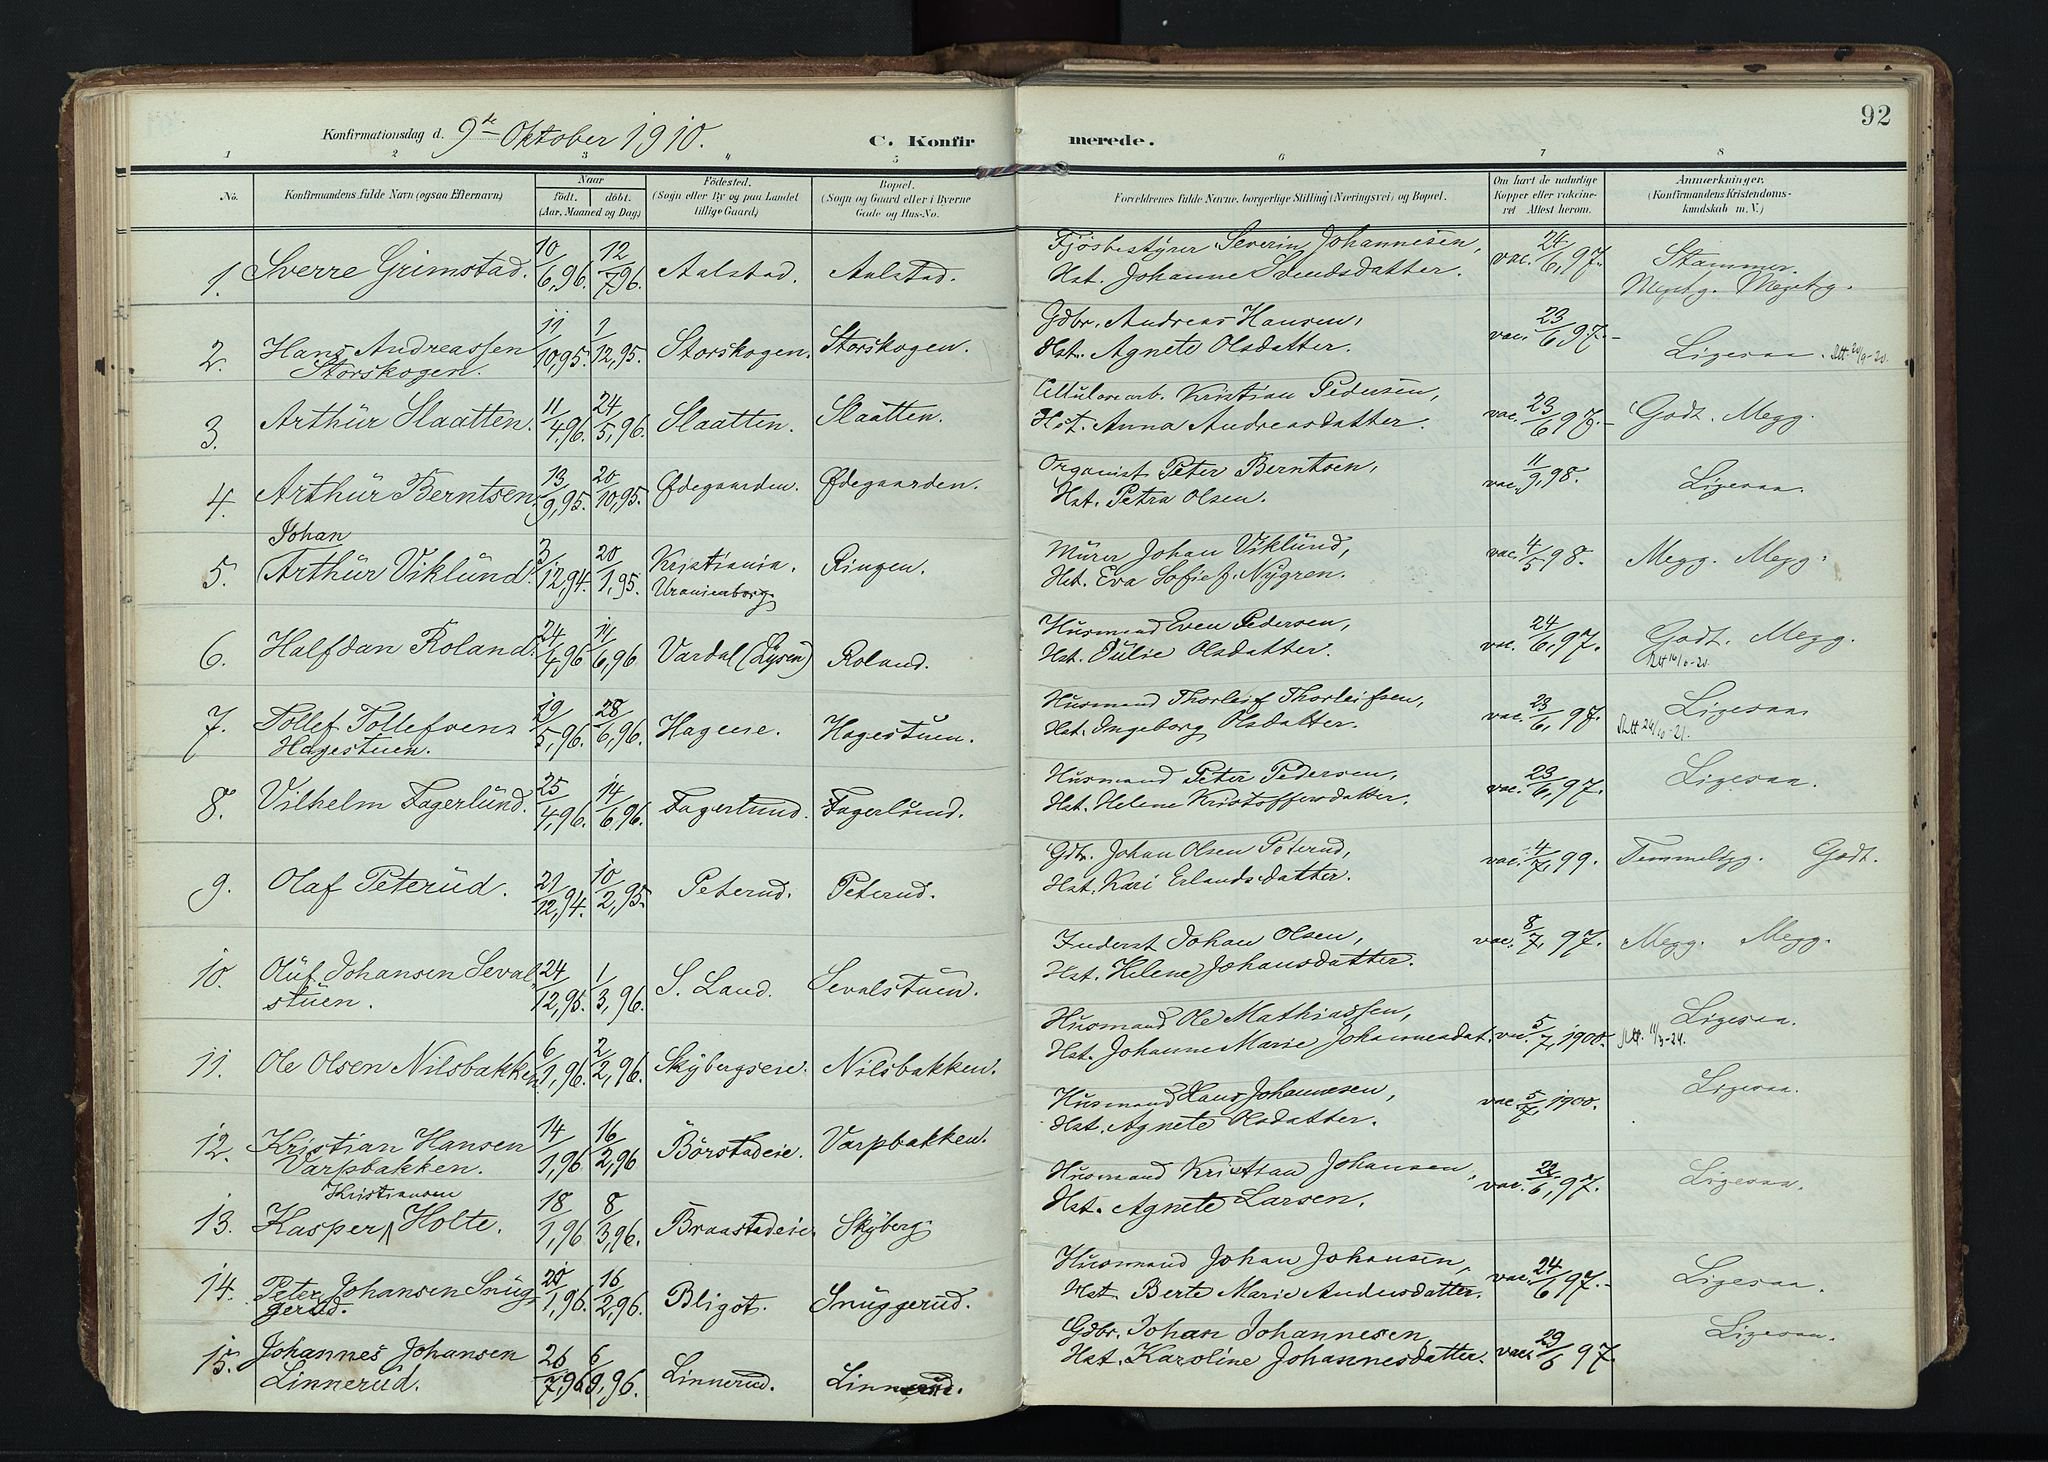 SAH, Vardal prestekontor, H/Ha/Haa/L0020: Ministerialbok nr. 20, 1907-1921, s. 92